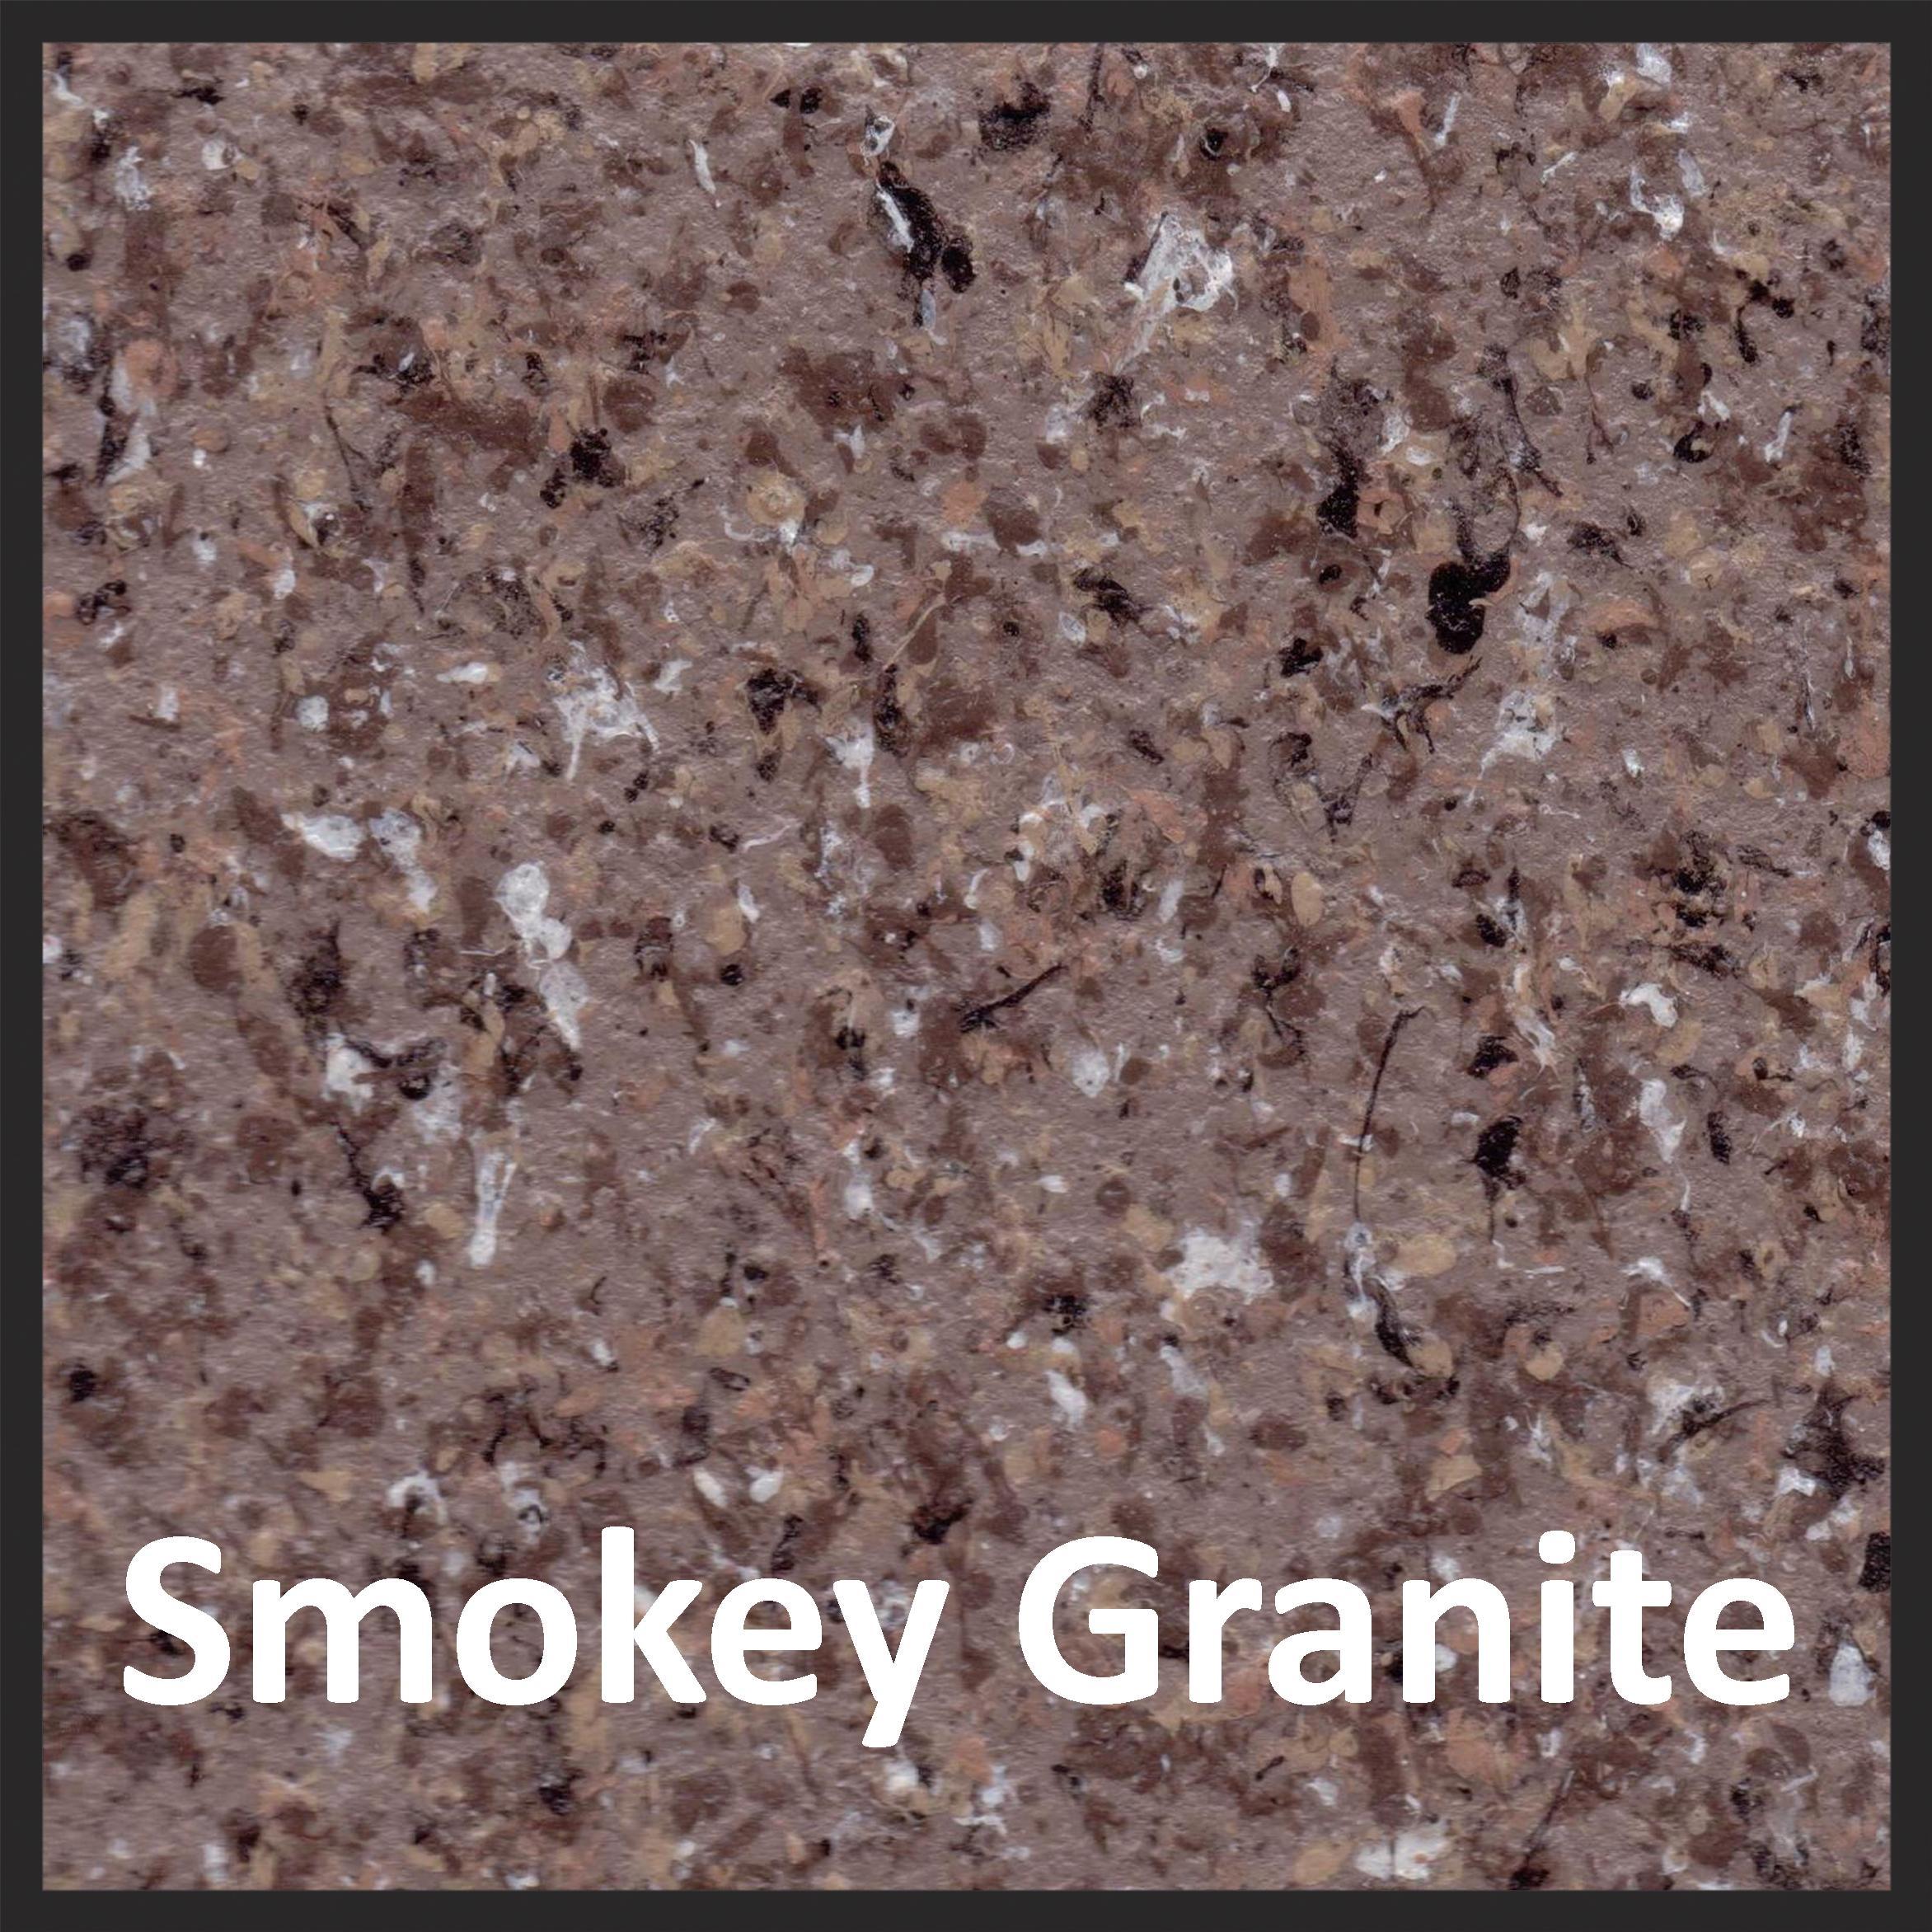 smokey-granite-label.jpg